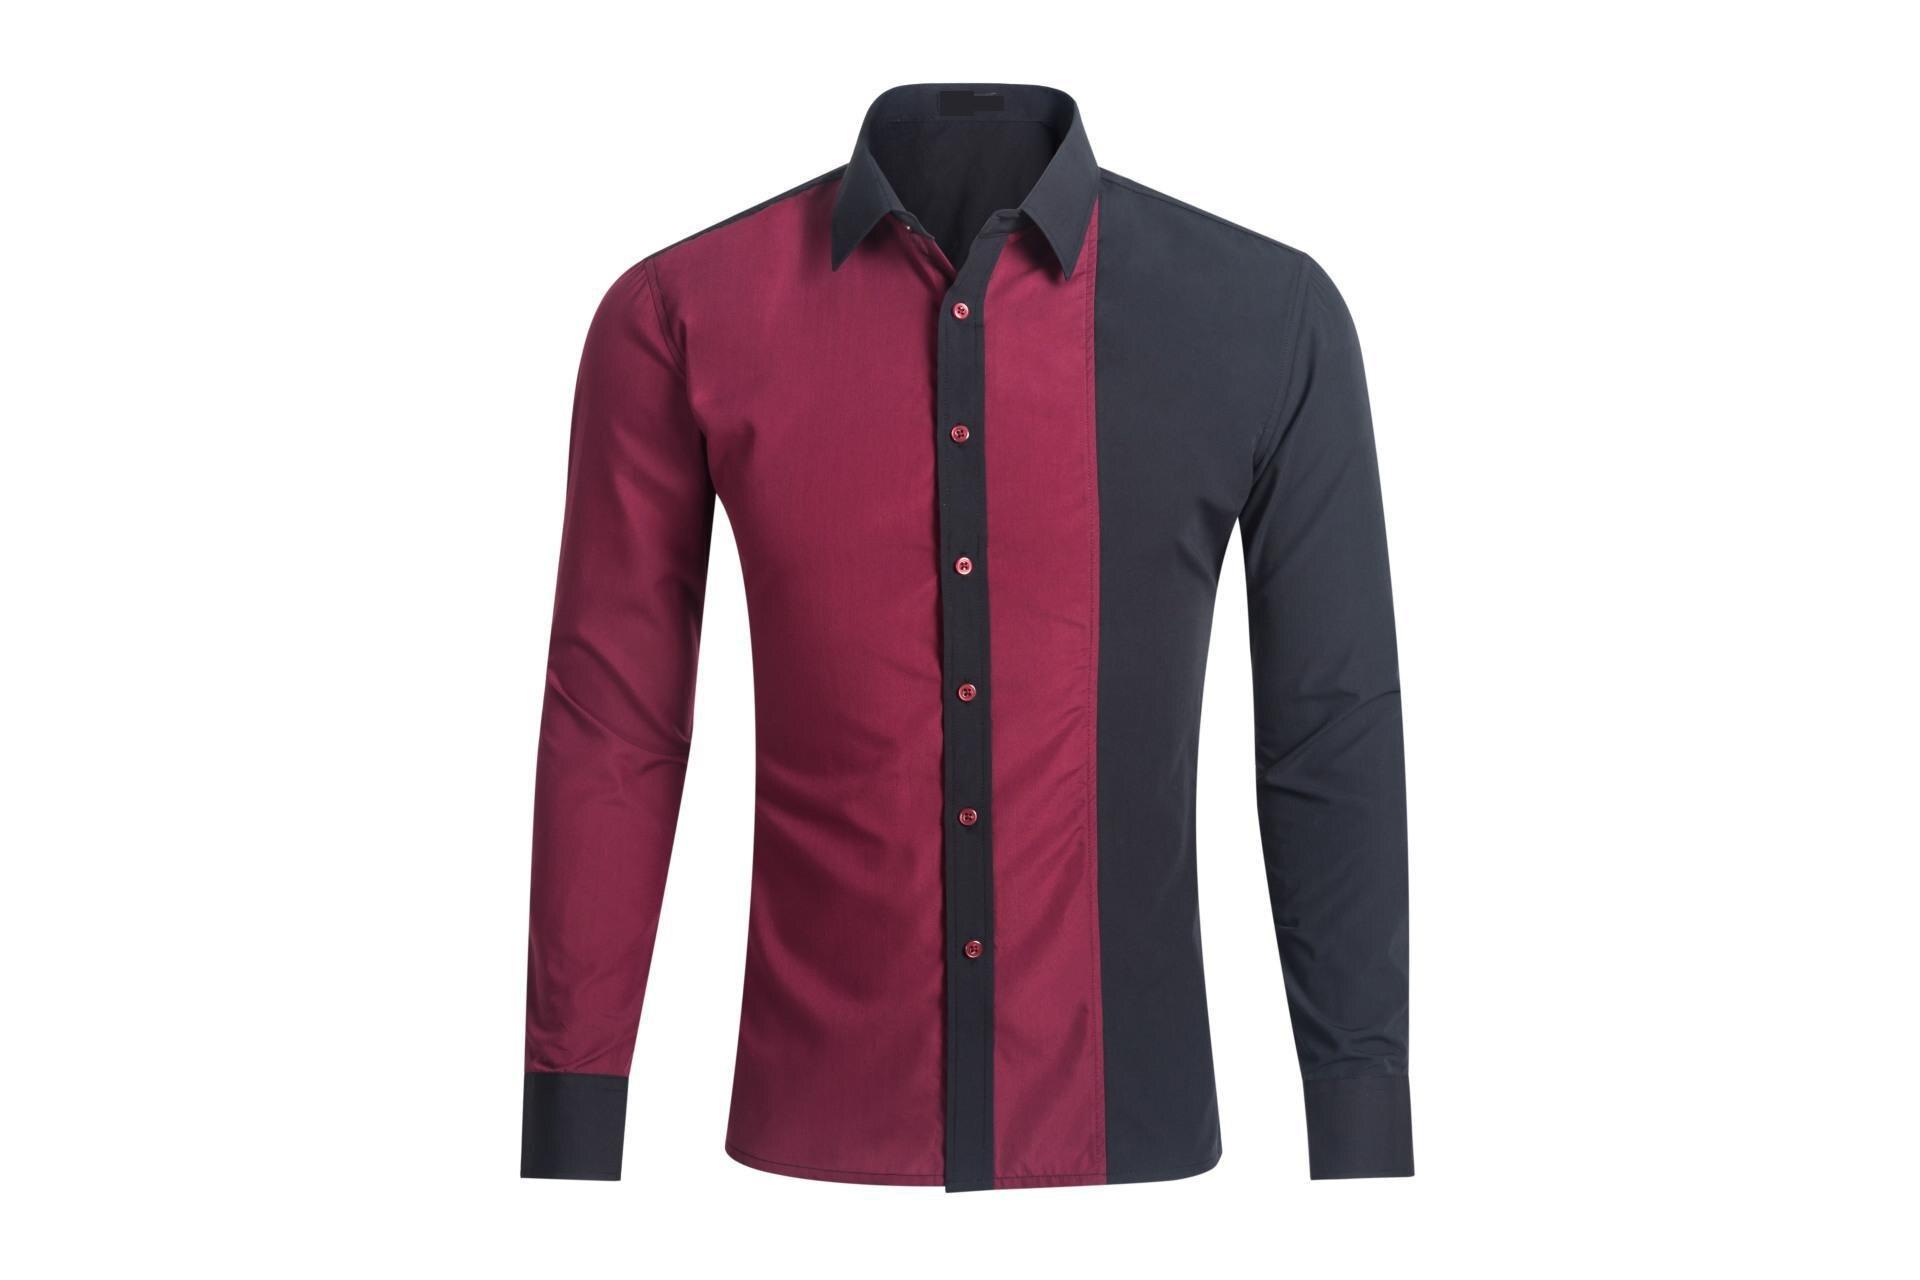 Shirt design of man - 2017 New Fashion Casual Men Shirt Long Sleeve Patchwork Slim Fit Shirt Men High Quality Cotton Men Designer Shirts Men Clothes In Casual Shirts From Men S